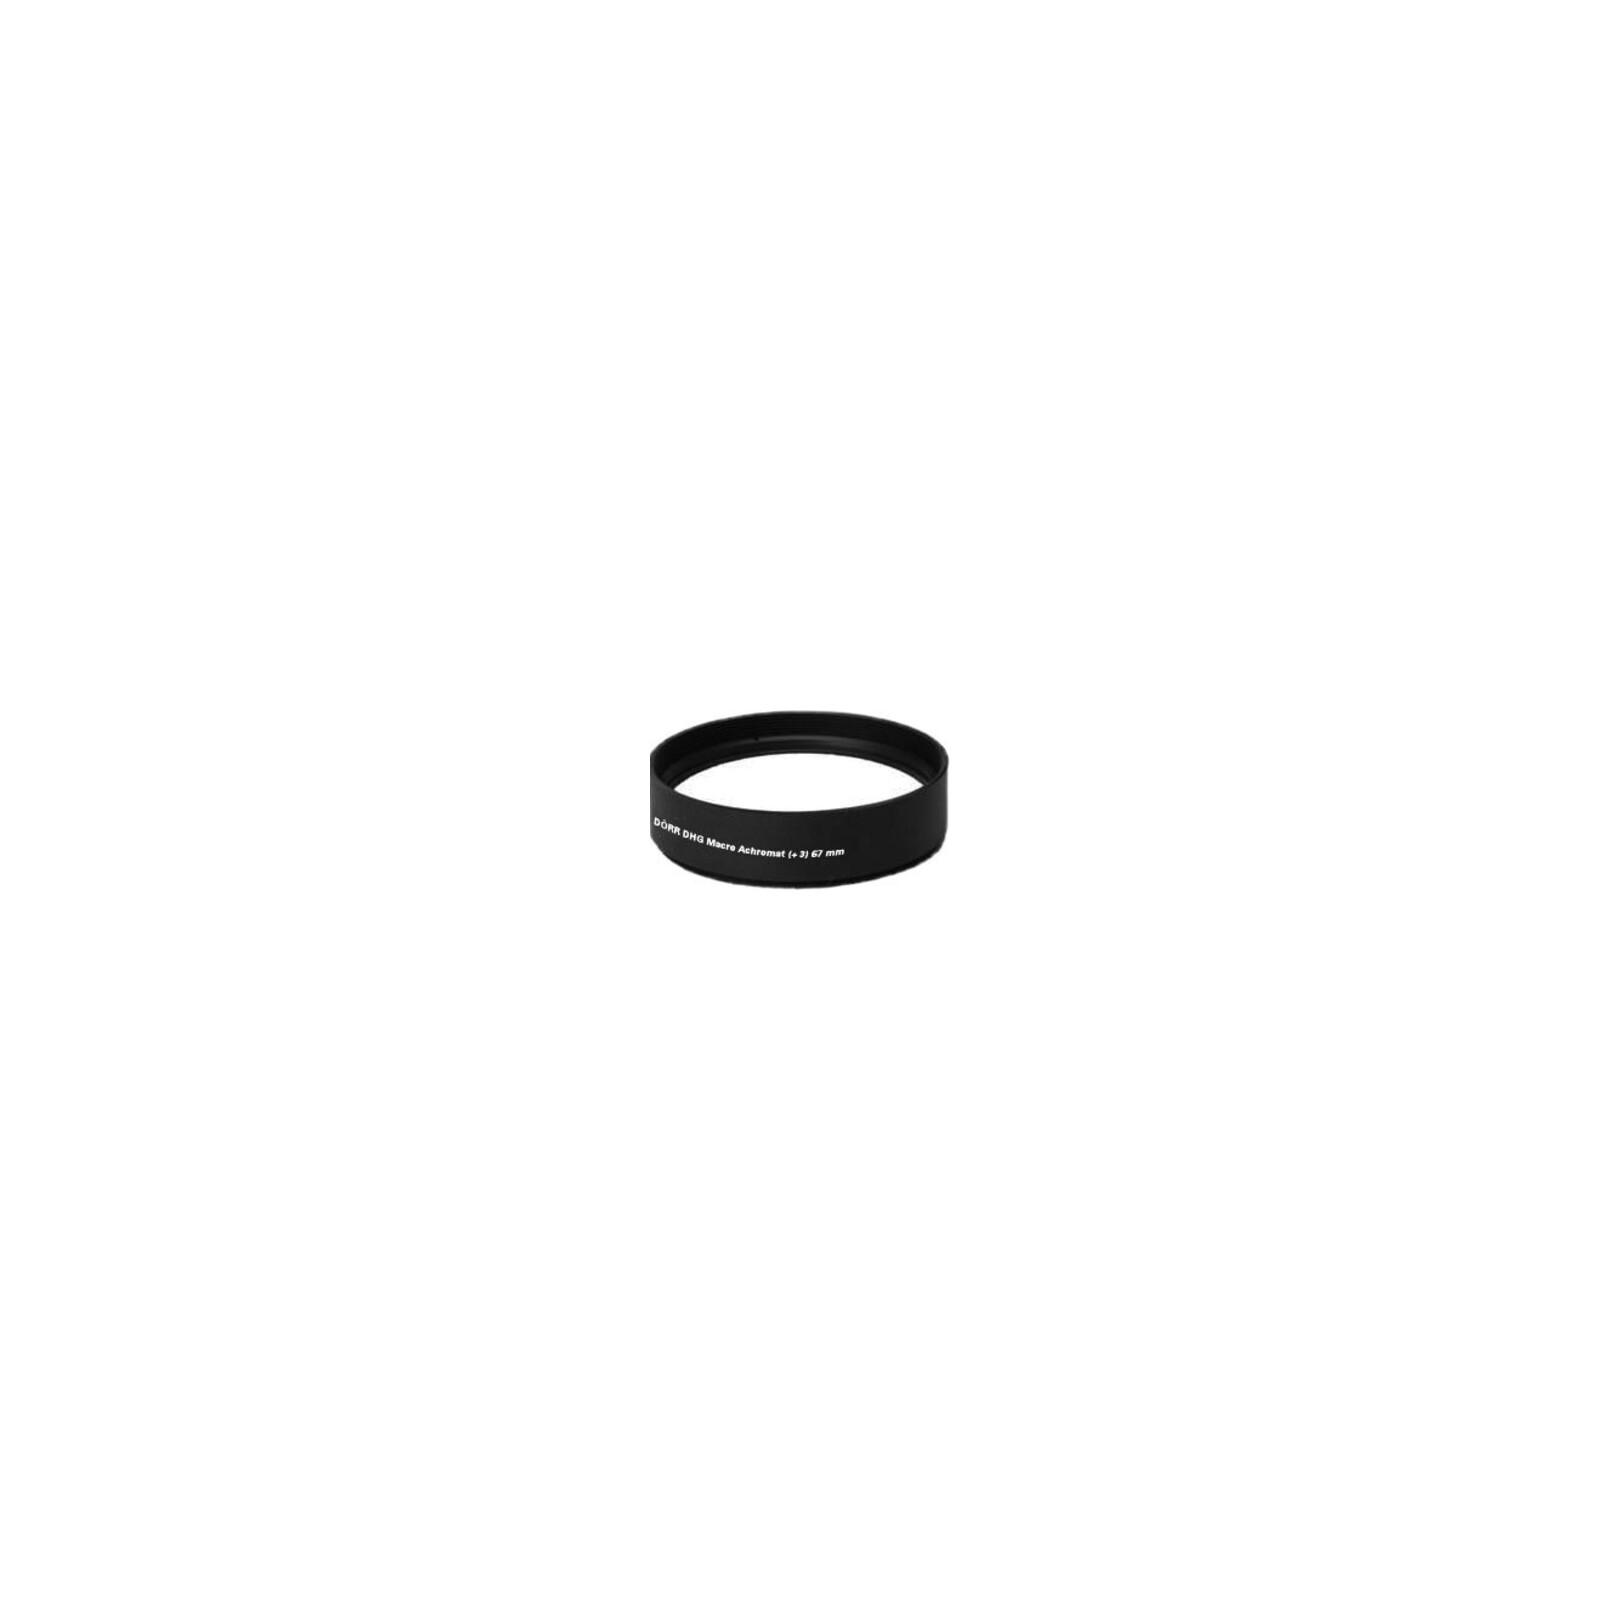 Dörr DHG Vorsatzachromat 5 Dioptrien 67mm (62+58mm)